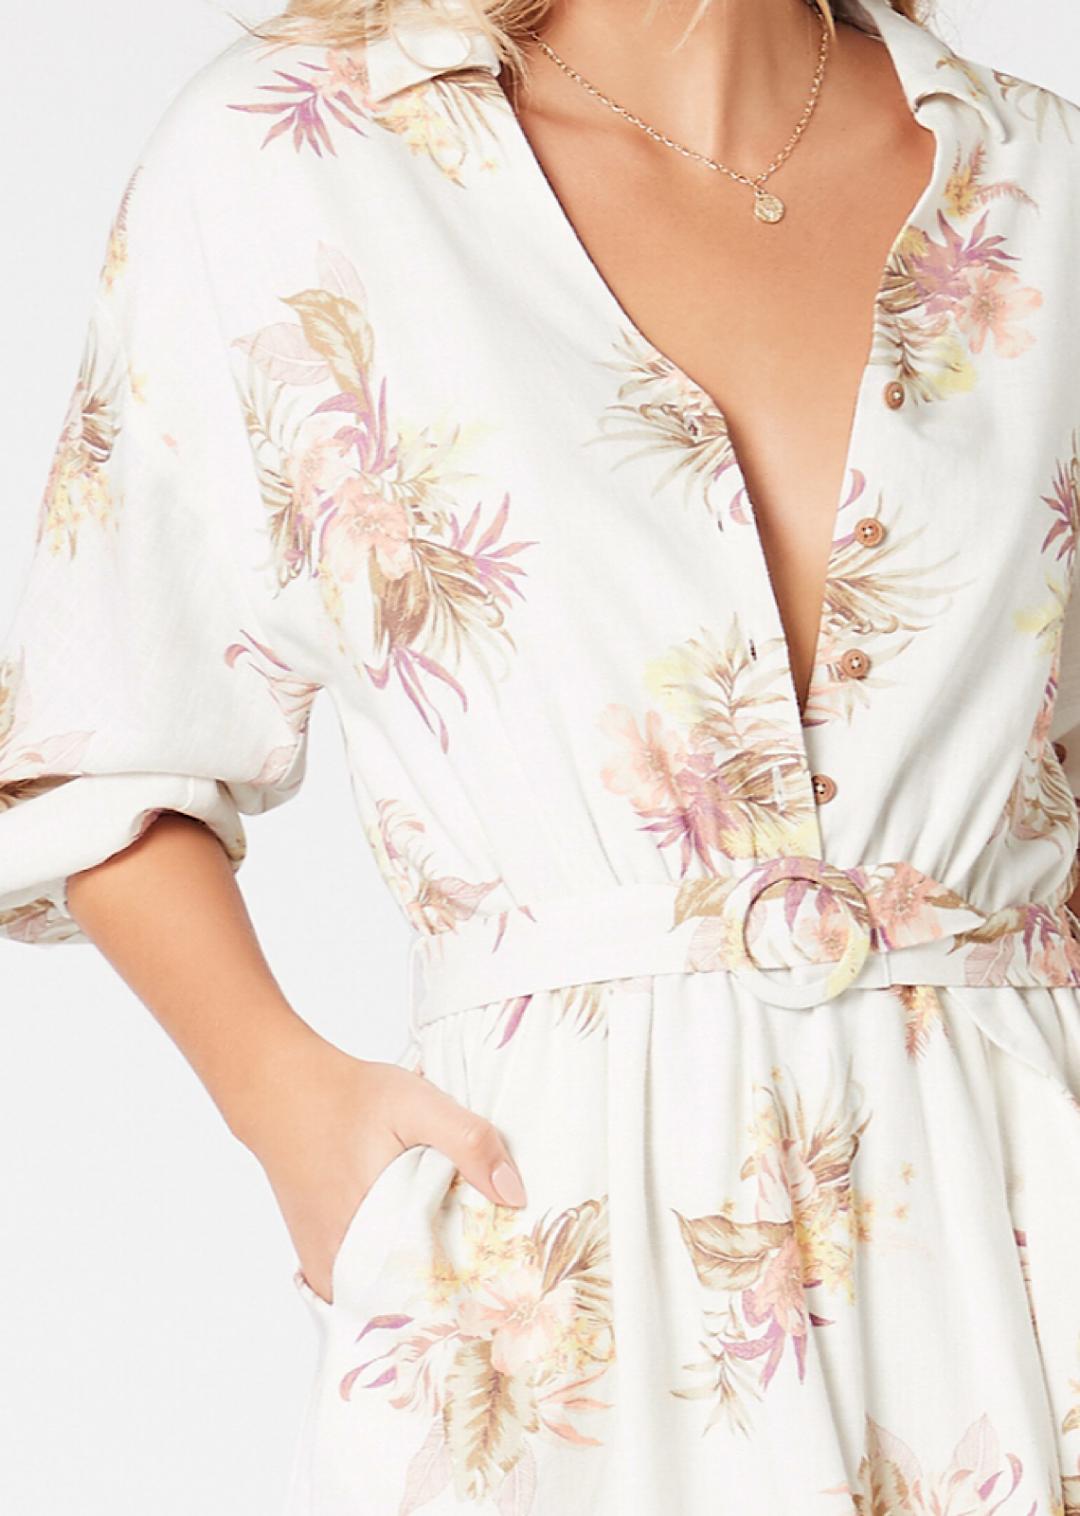 MINKPINK Tropic Dreaming Shirt Dress